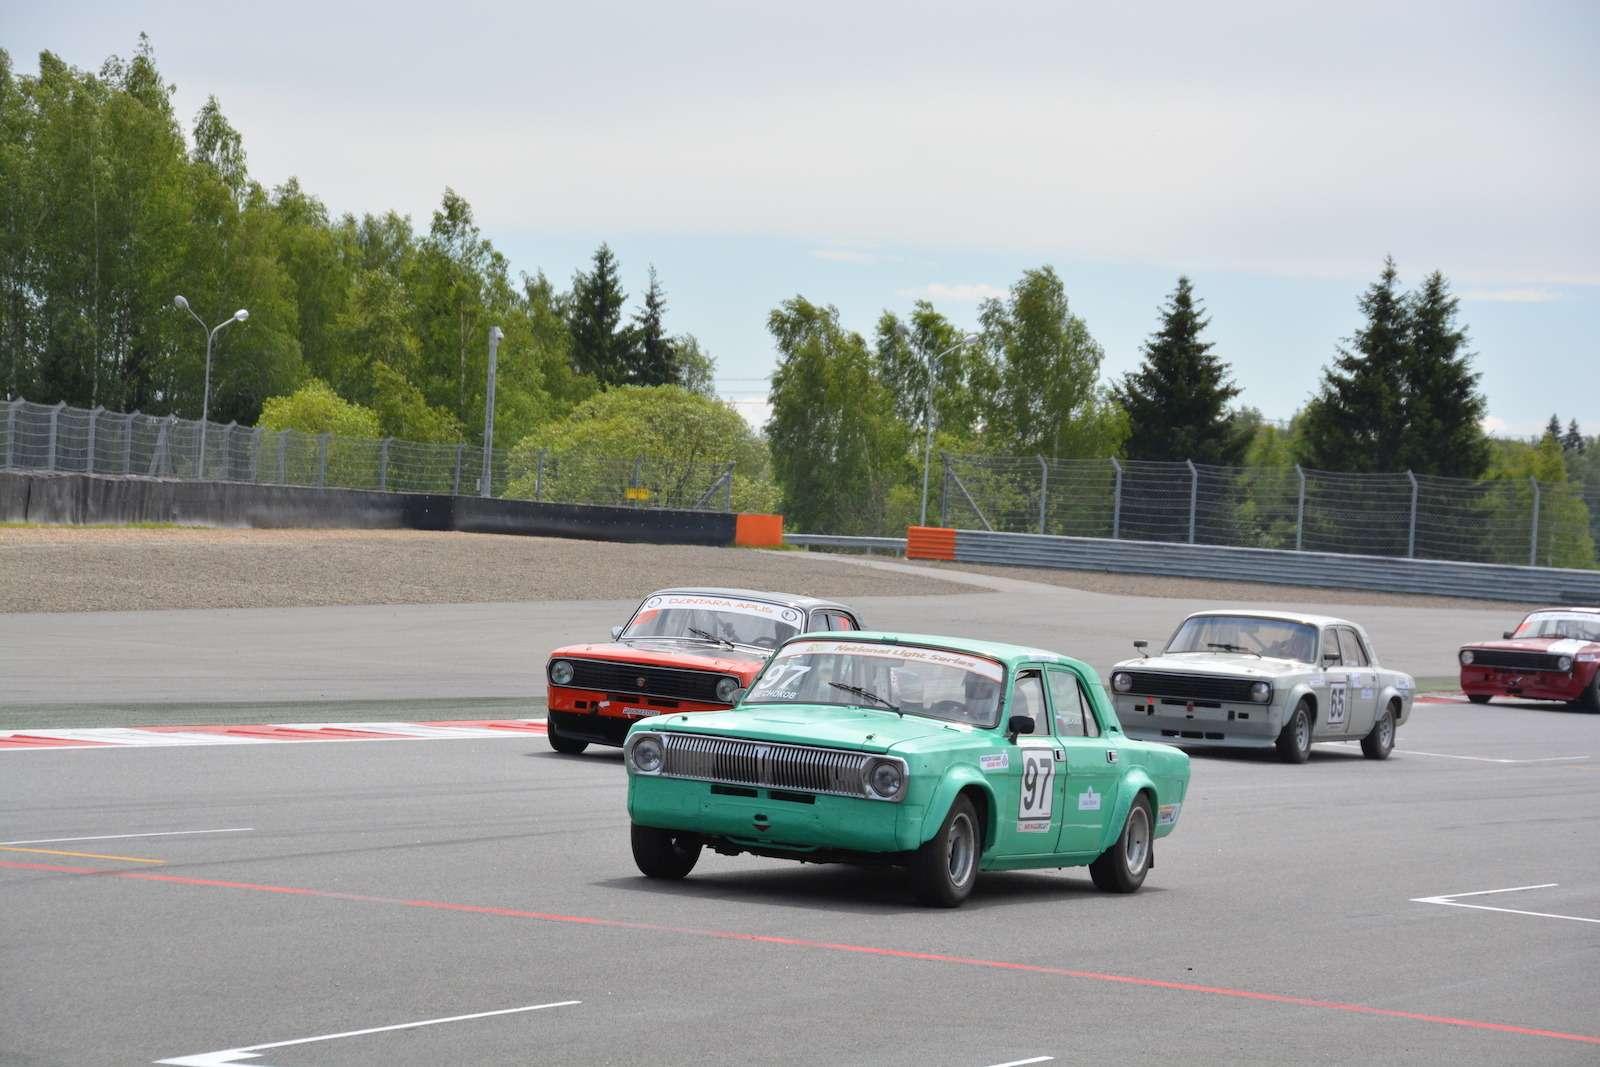 НаMoscow Raceway прошли гонки ретромобилей— фото 380482